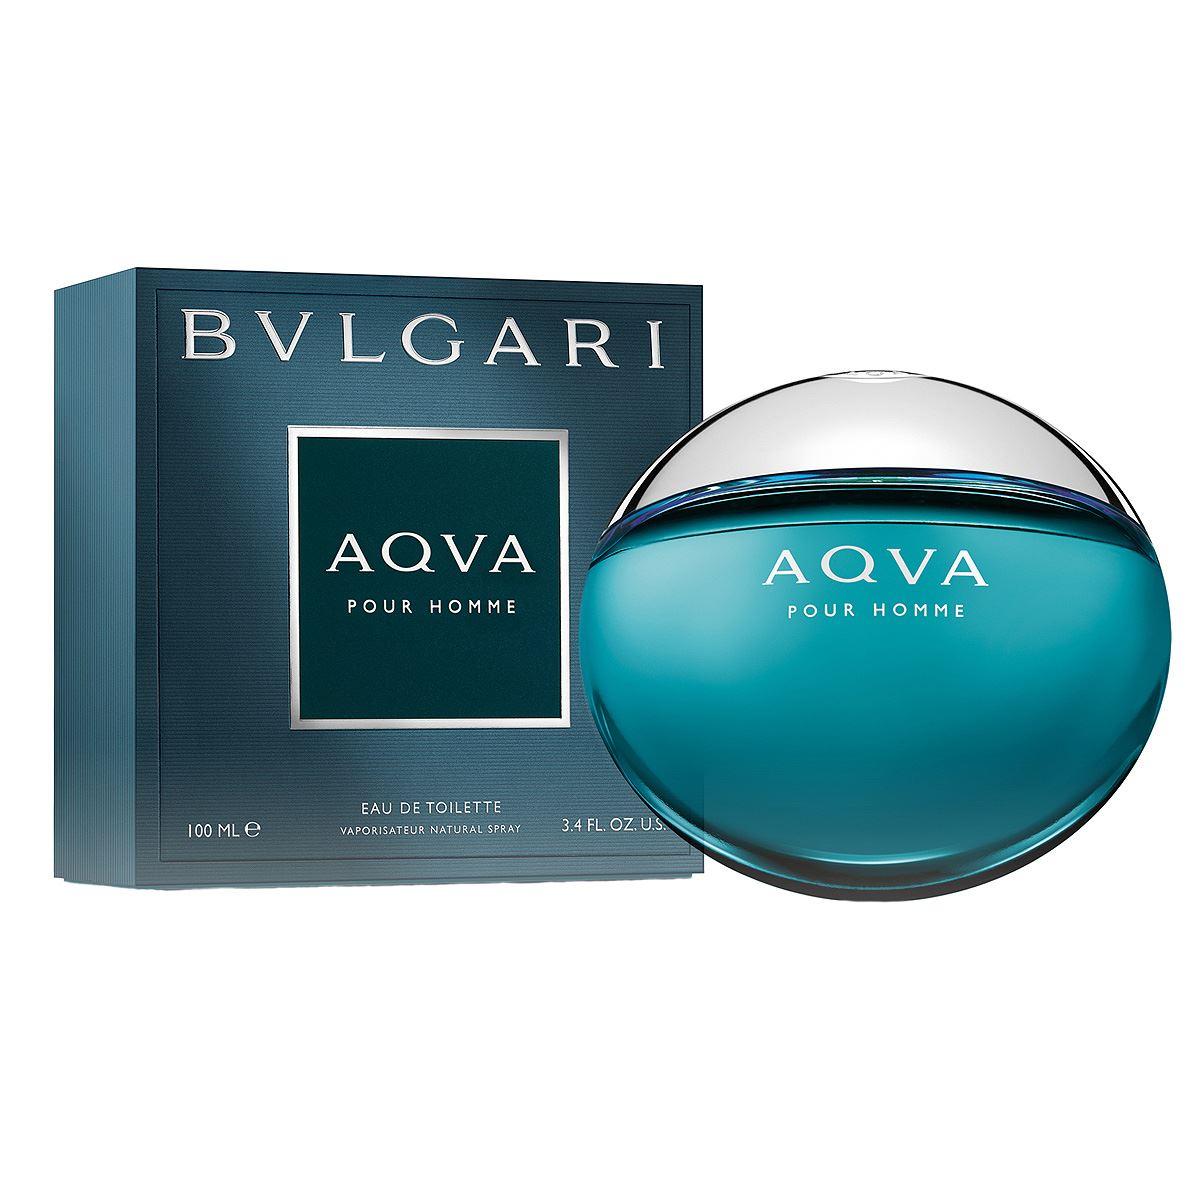 Aqua Bvlgari 91152 Edt 100 ml